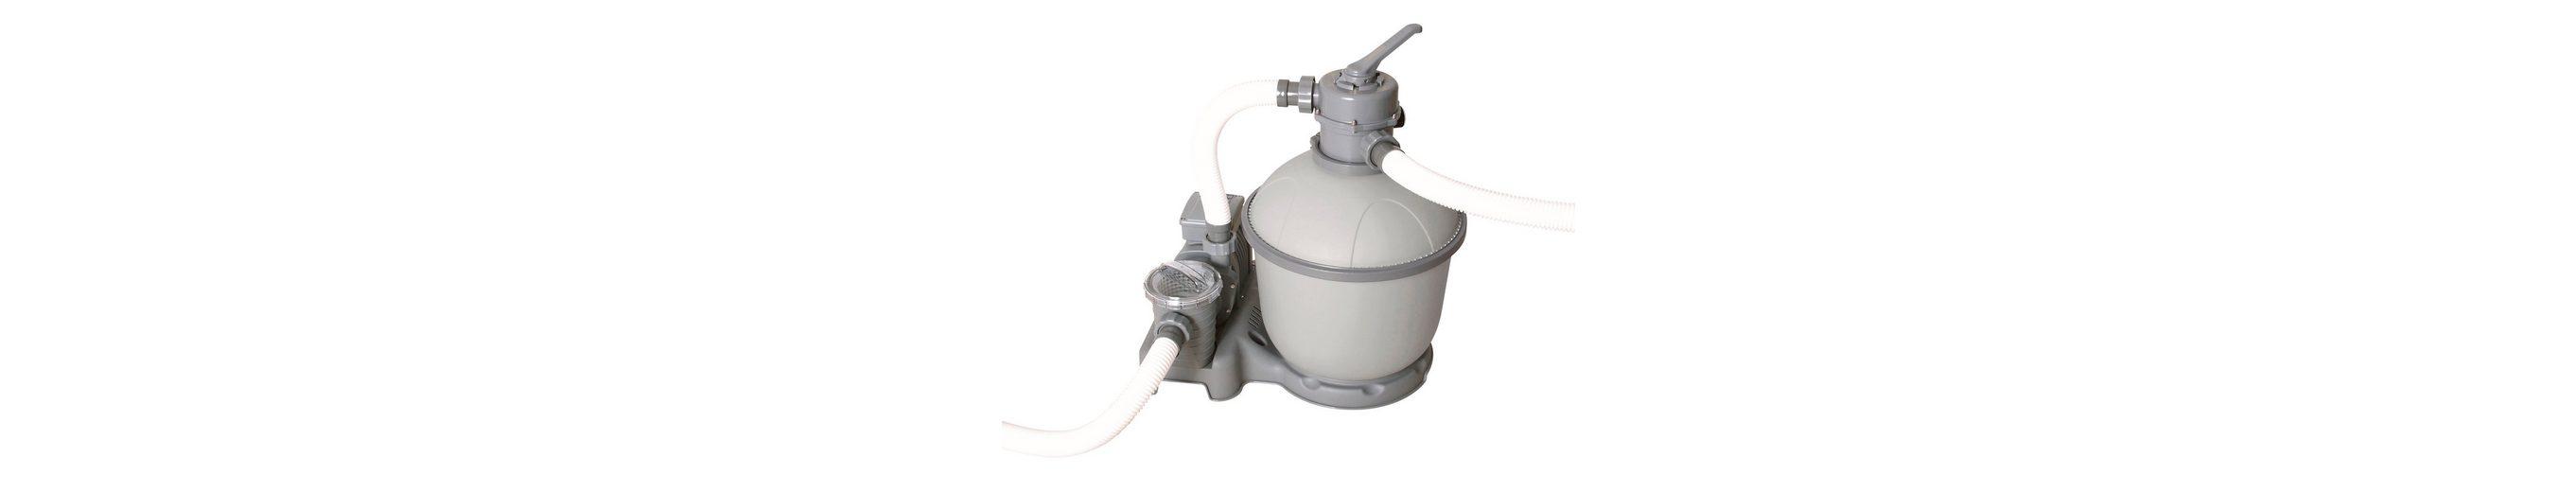 Sandfilteranlage »Flowclear Sandfilterpumpe 5.678 l/h«